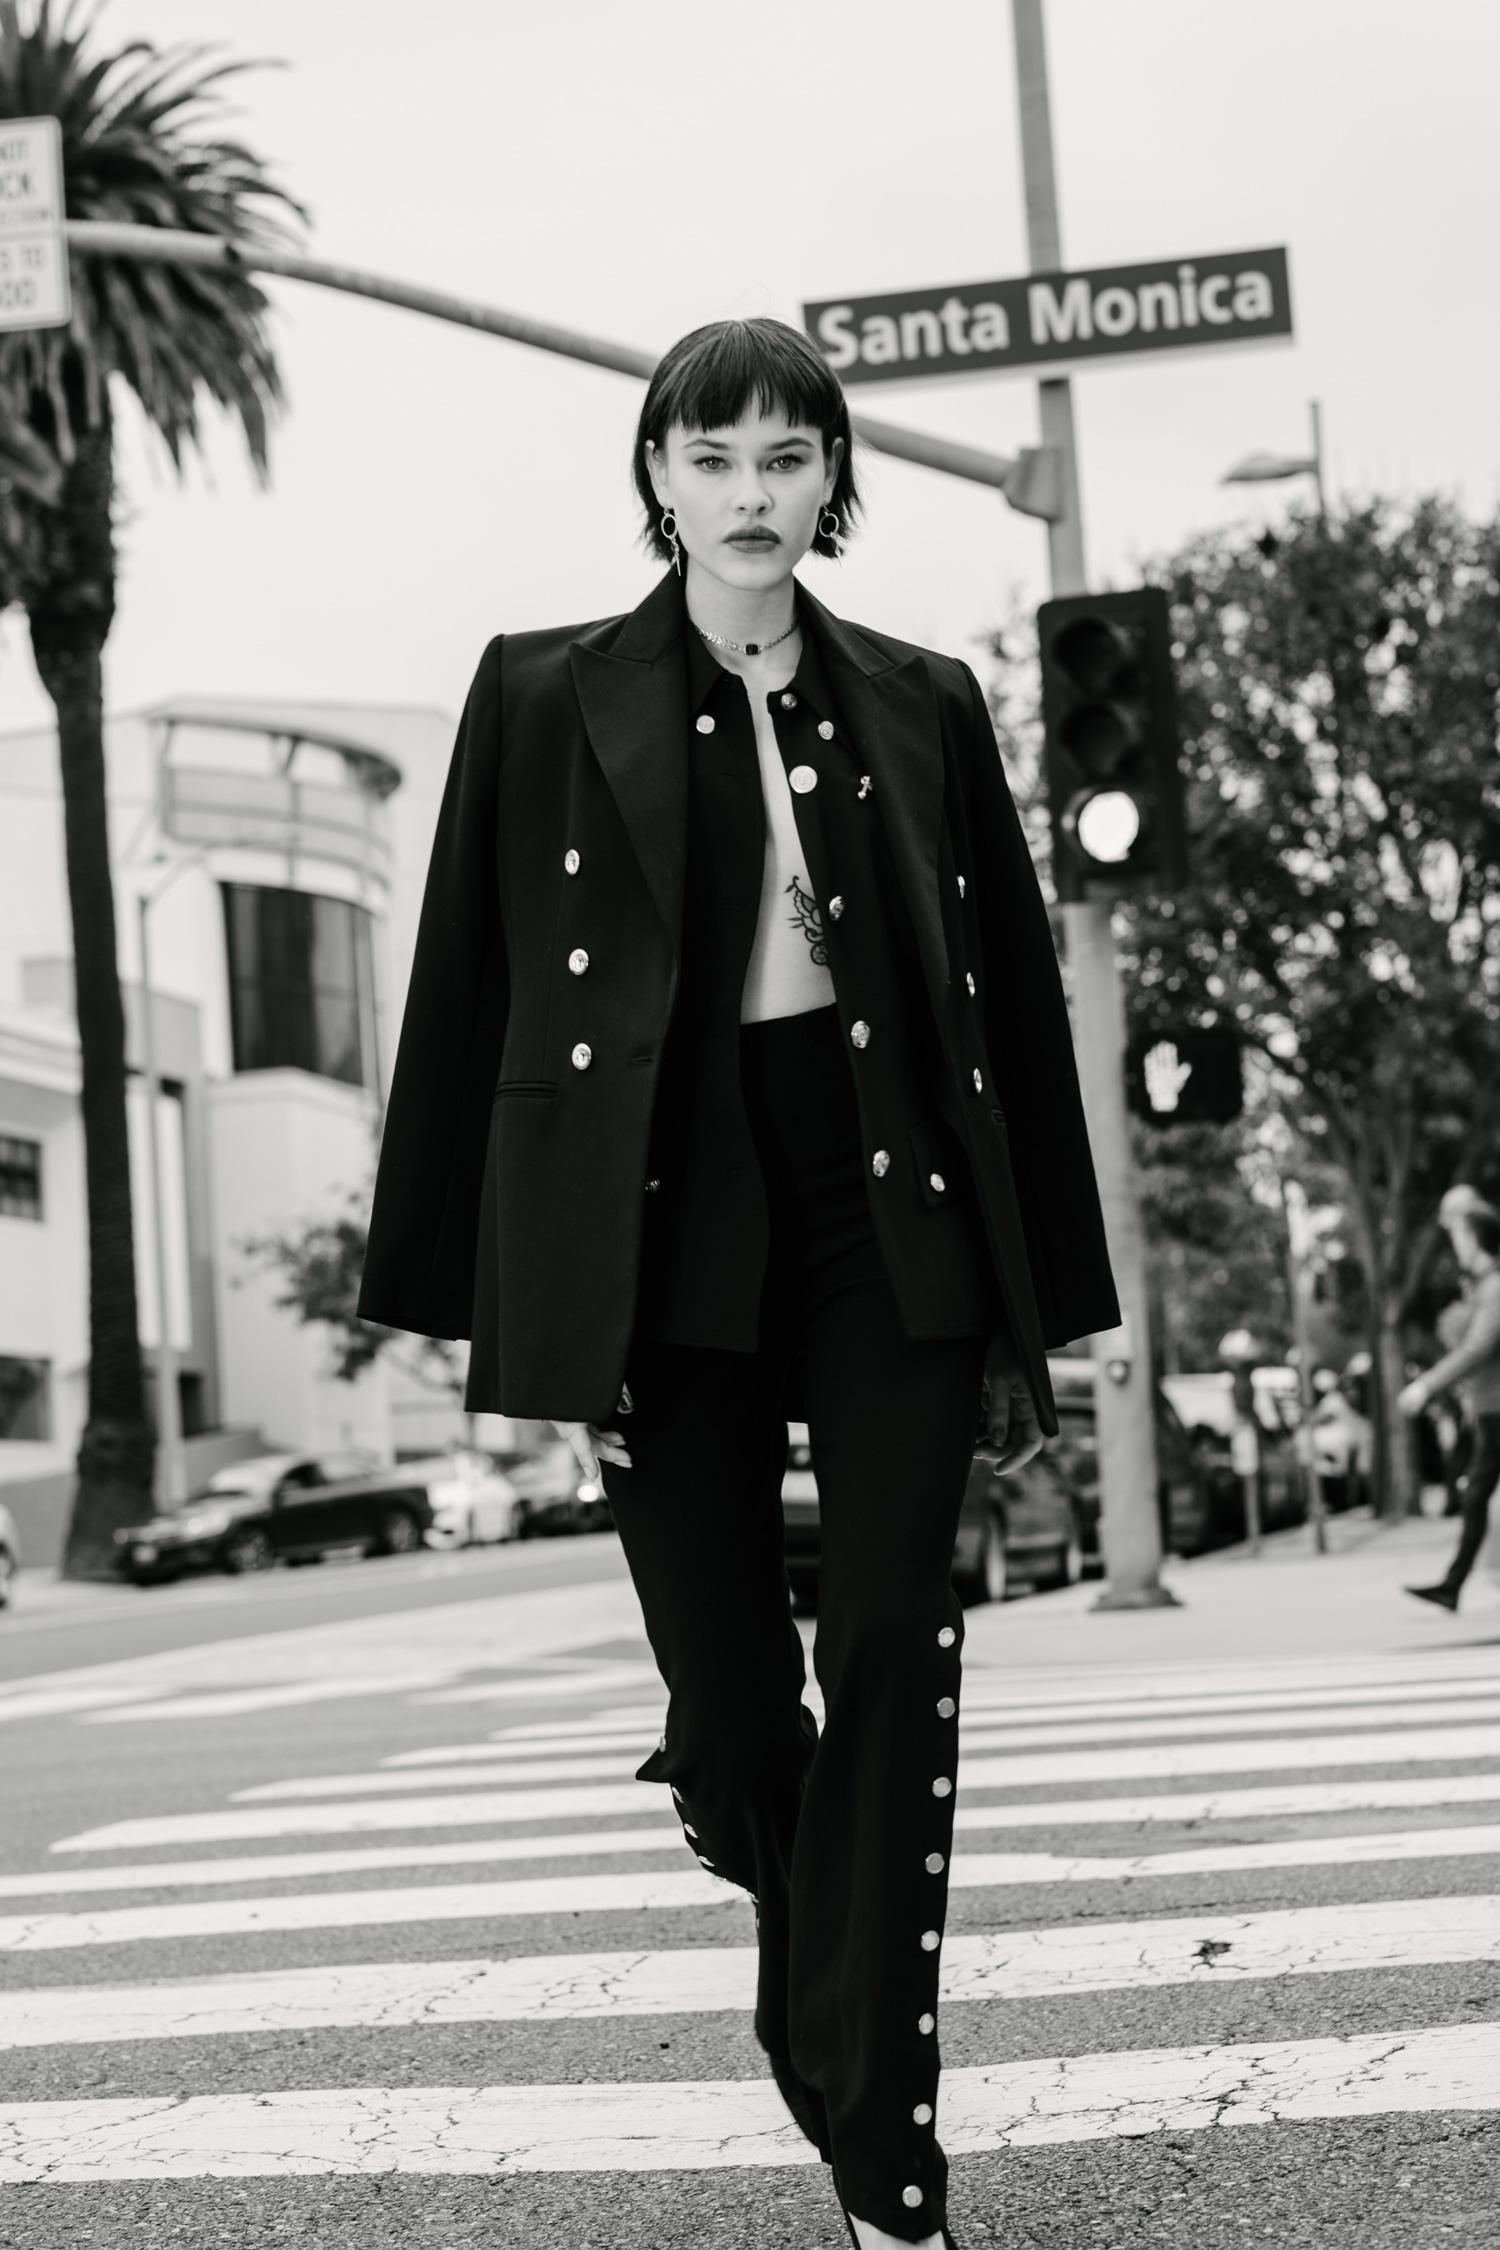 019-LA-Urban-Street-Style.jpg